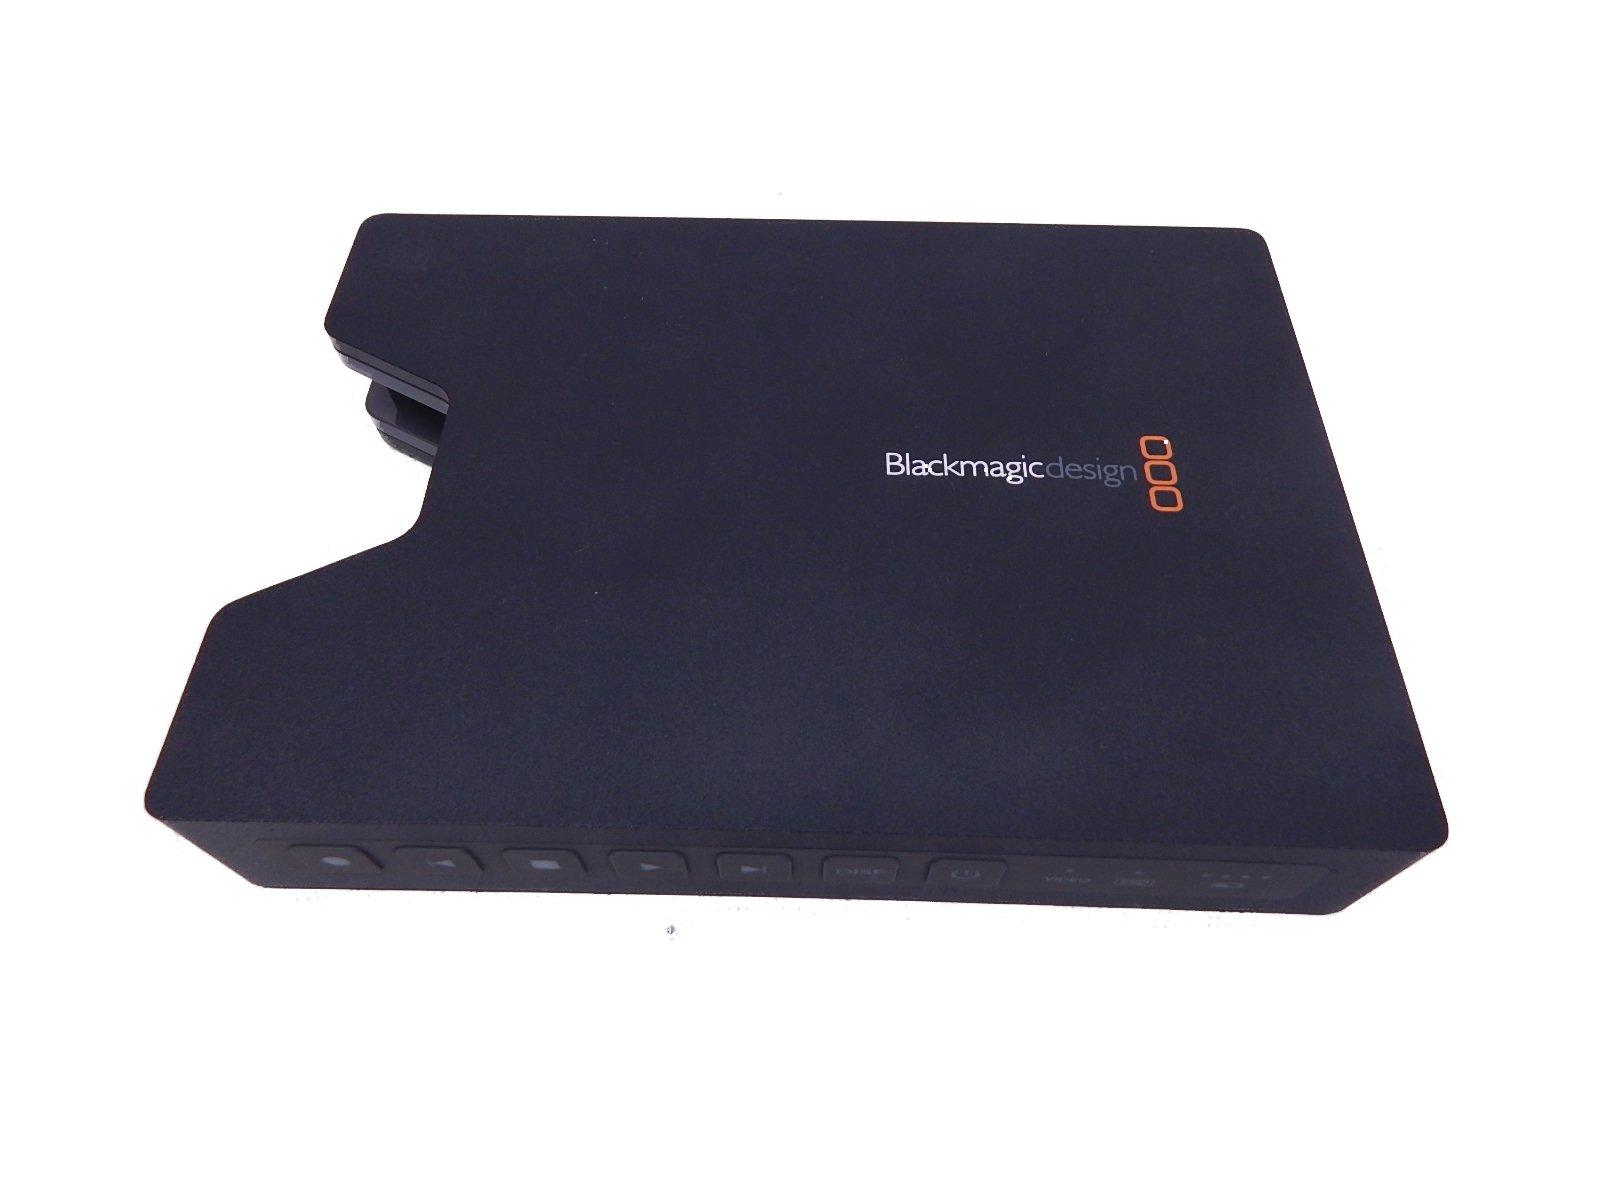 Blackmagic Design HyperDeck Shuttle 2 | Portable SSD Recorder